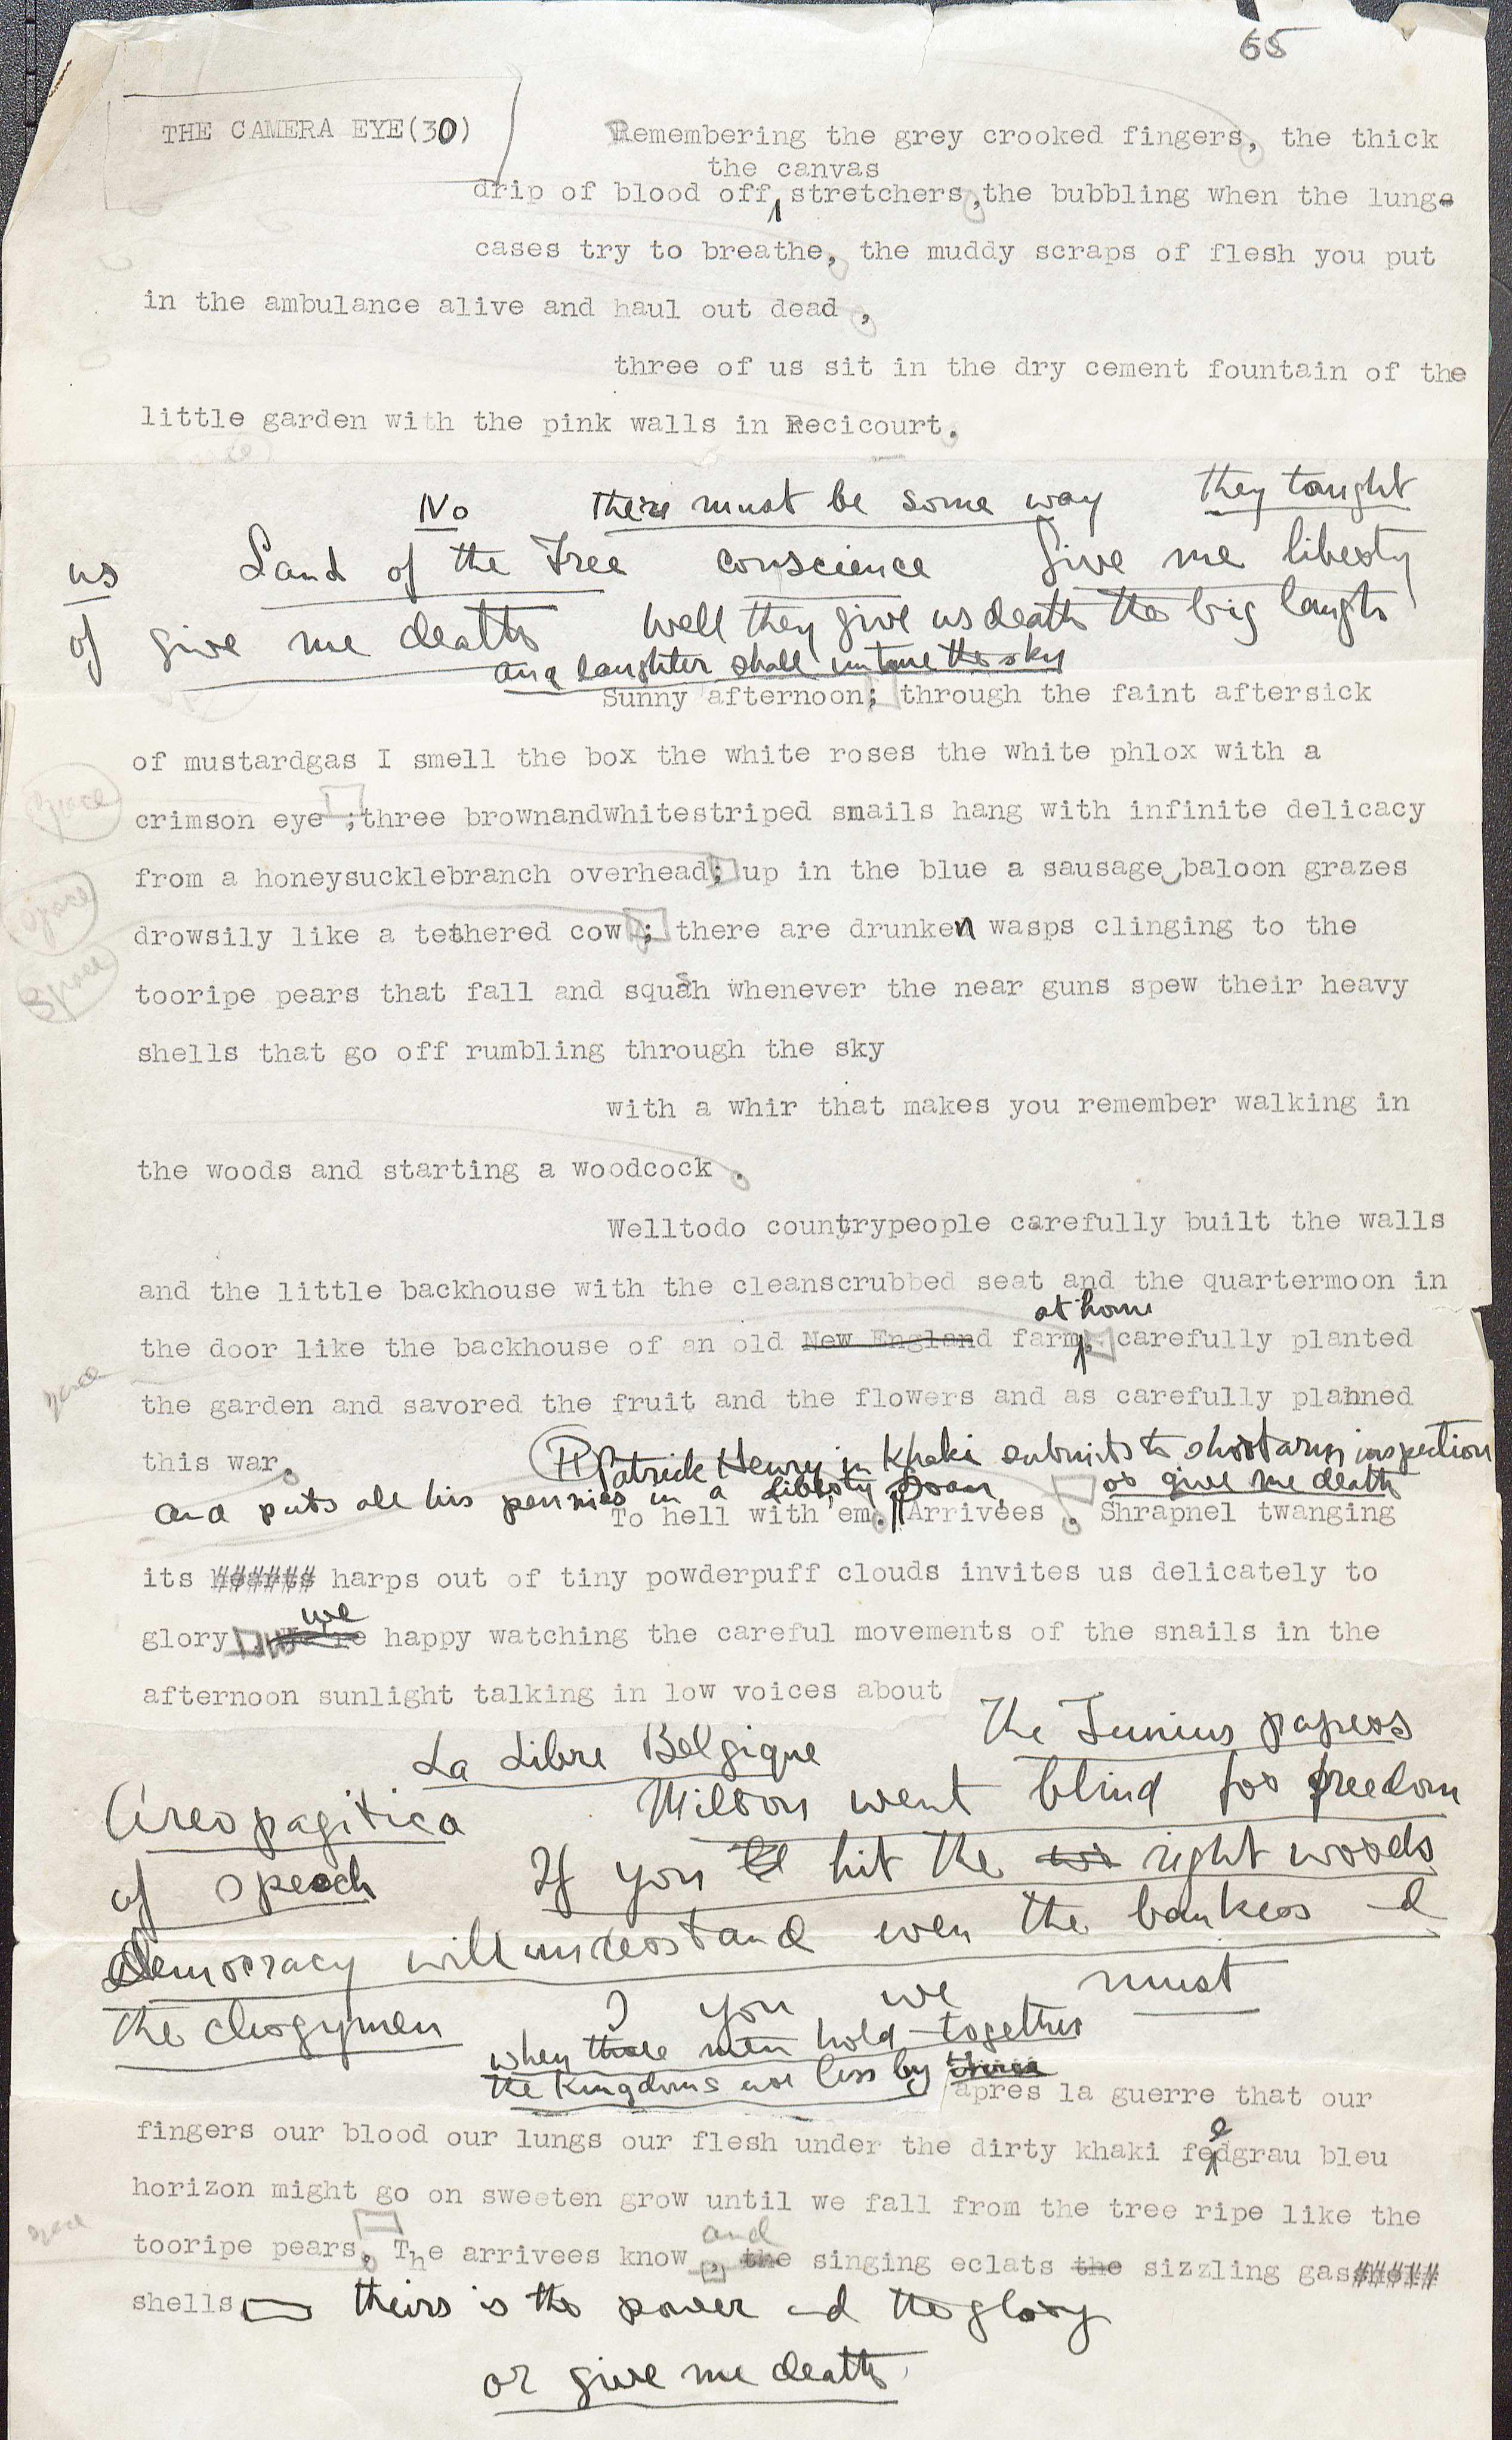 Manuscript draft of Nineteen Nineteen, ca. 1932. (MSS 5950. Image by Petrina Jackson.)